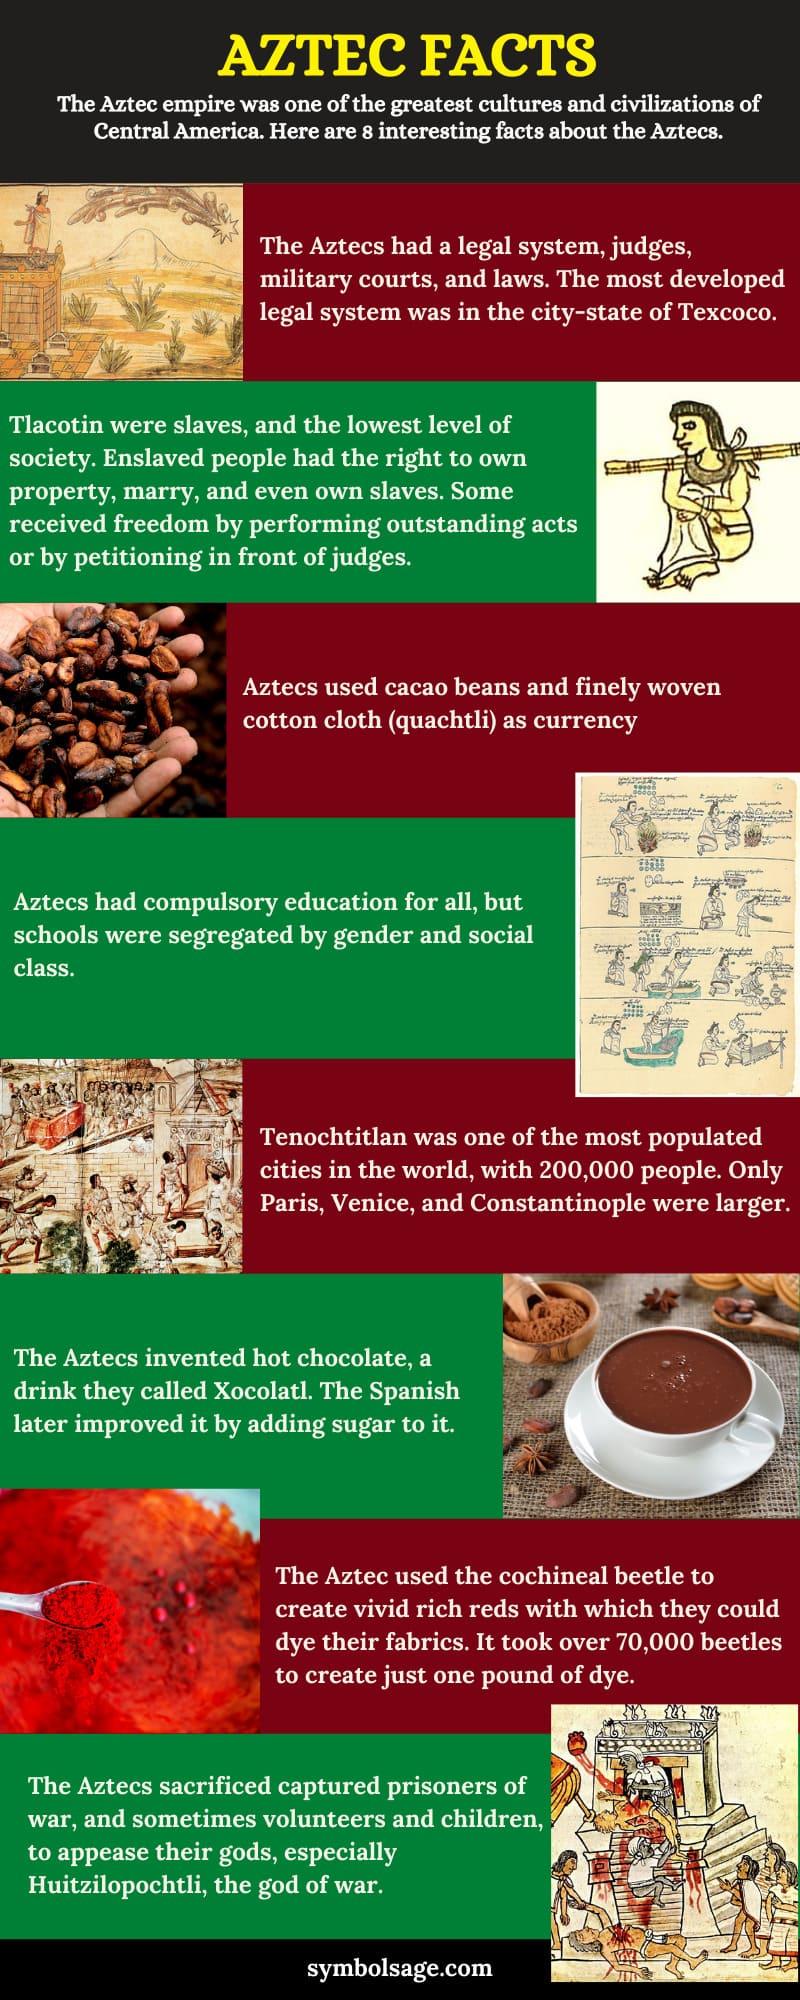 Aztec facts